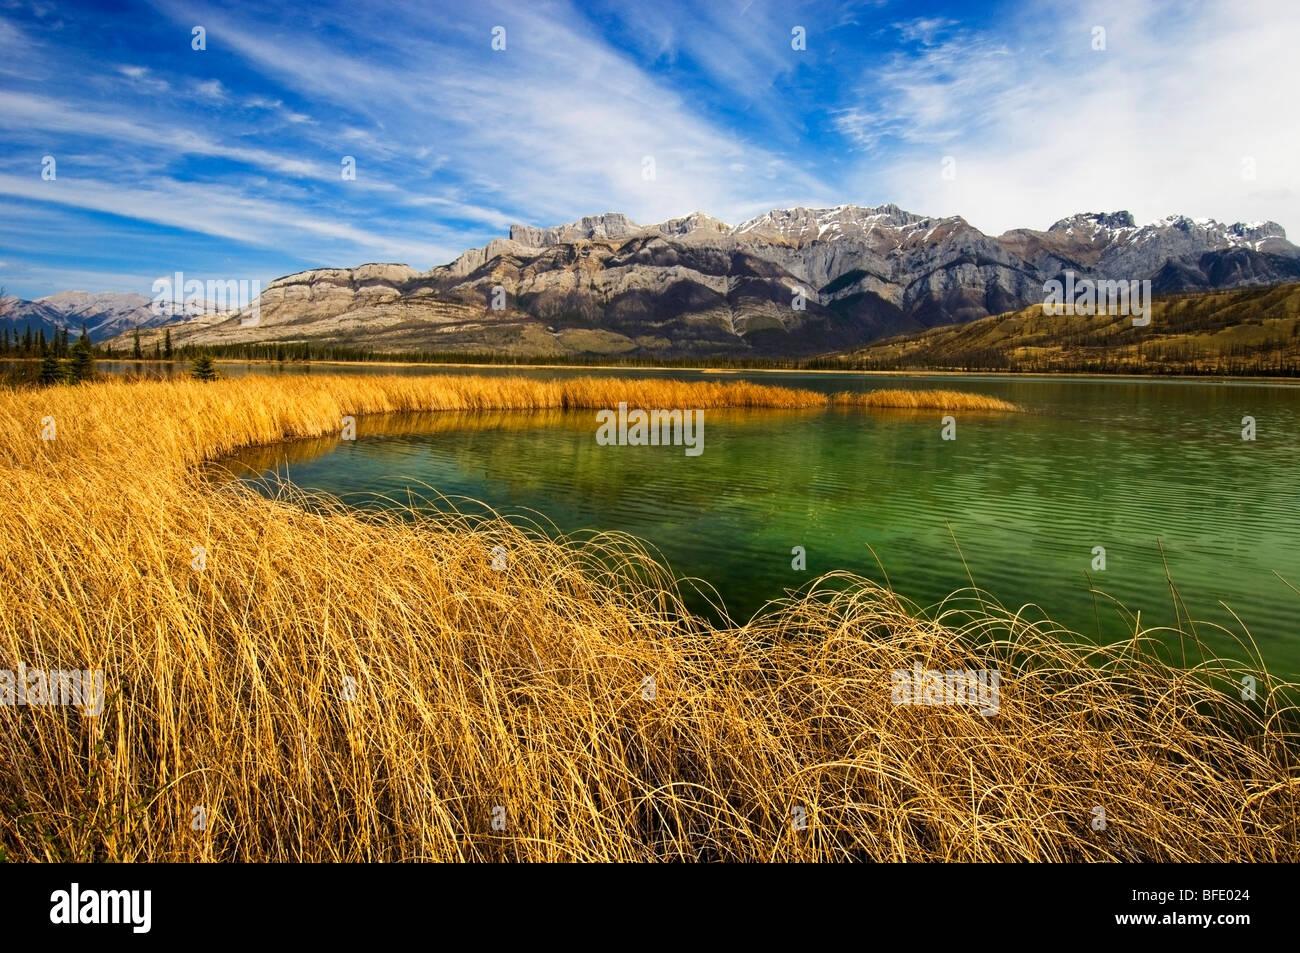 Talbot Lake and the Miette Range, Jasper National Park, Alberta, Canada - Stock Image